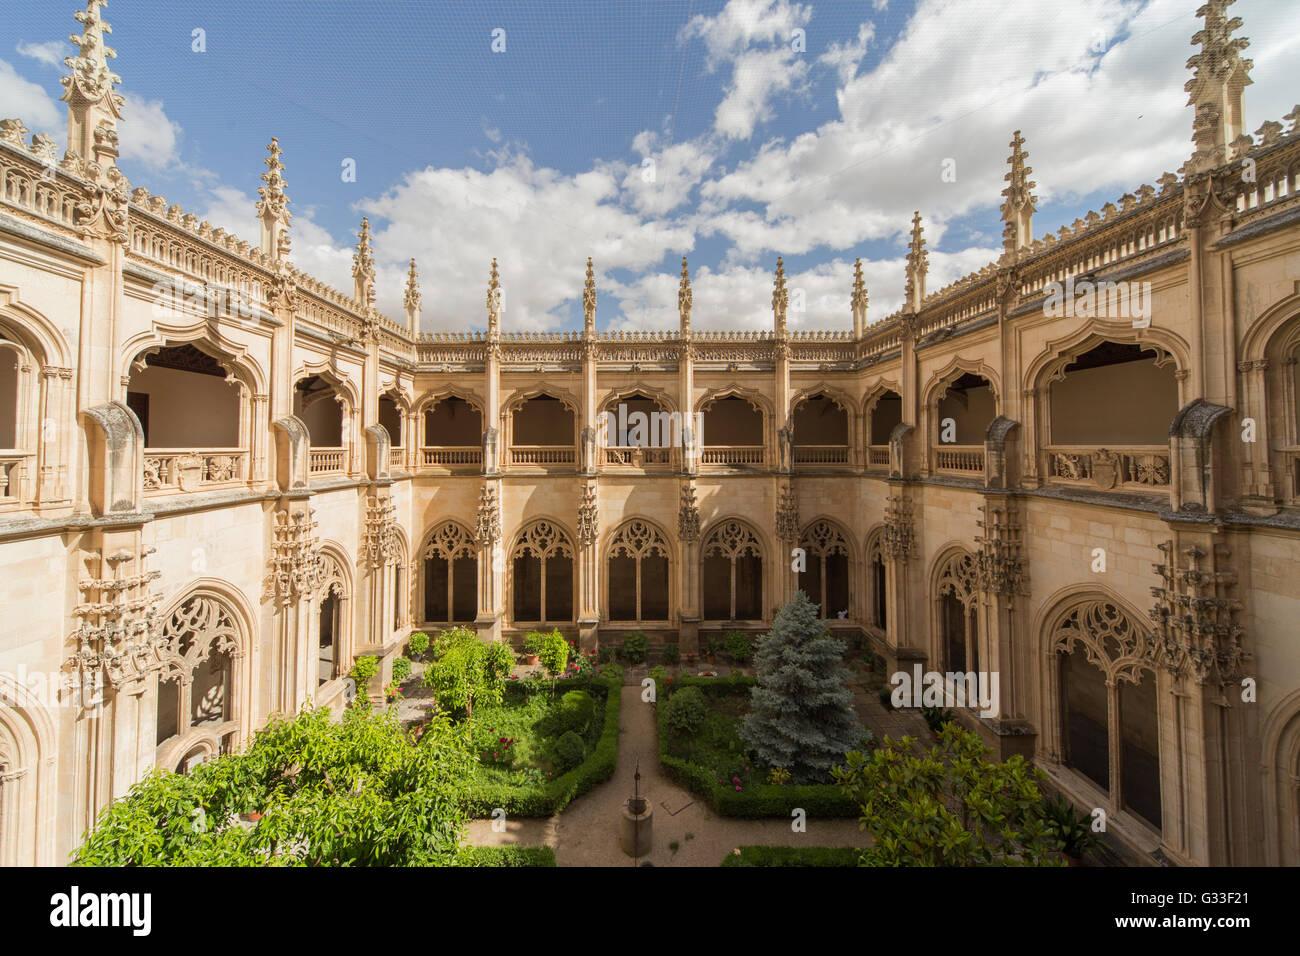 Monastery of Saint John of the Kings in Toledo Spain  Interior Cloister garden (The Monastery of San Juan de los - Stock Image